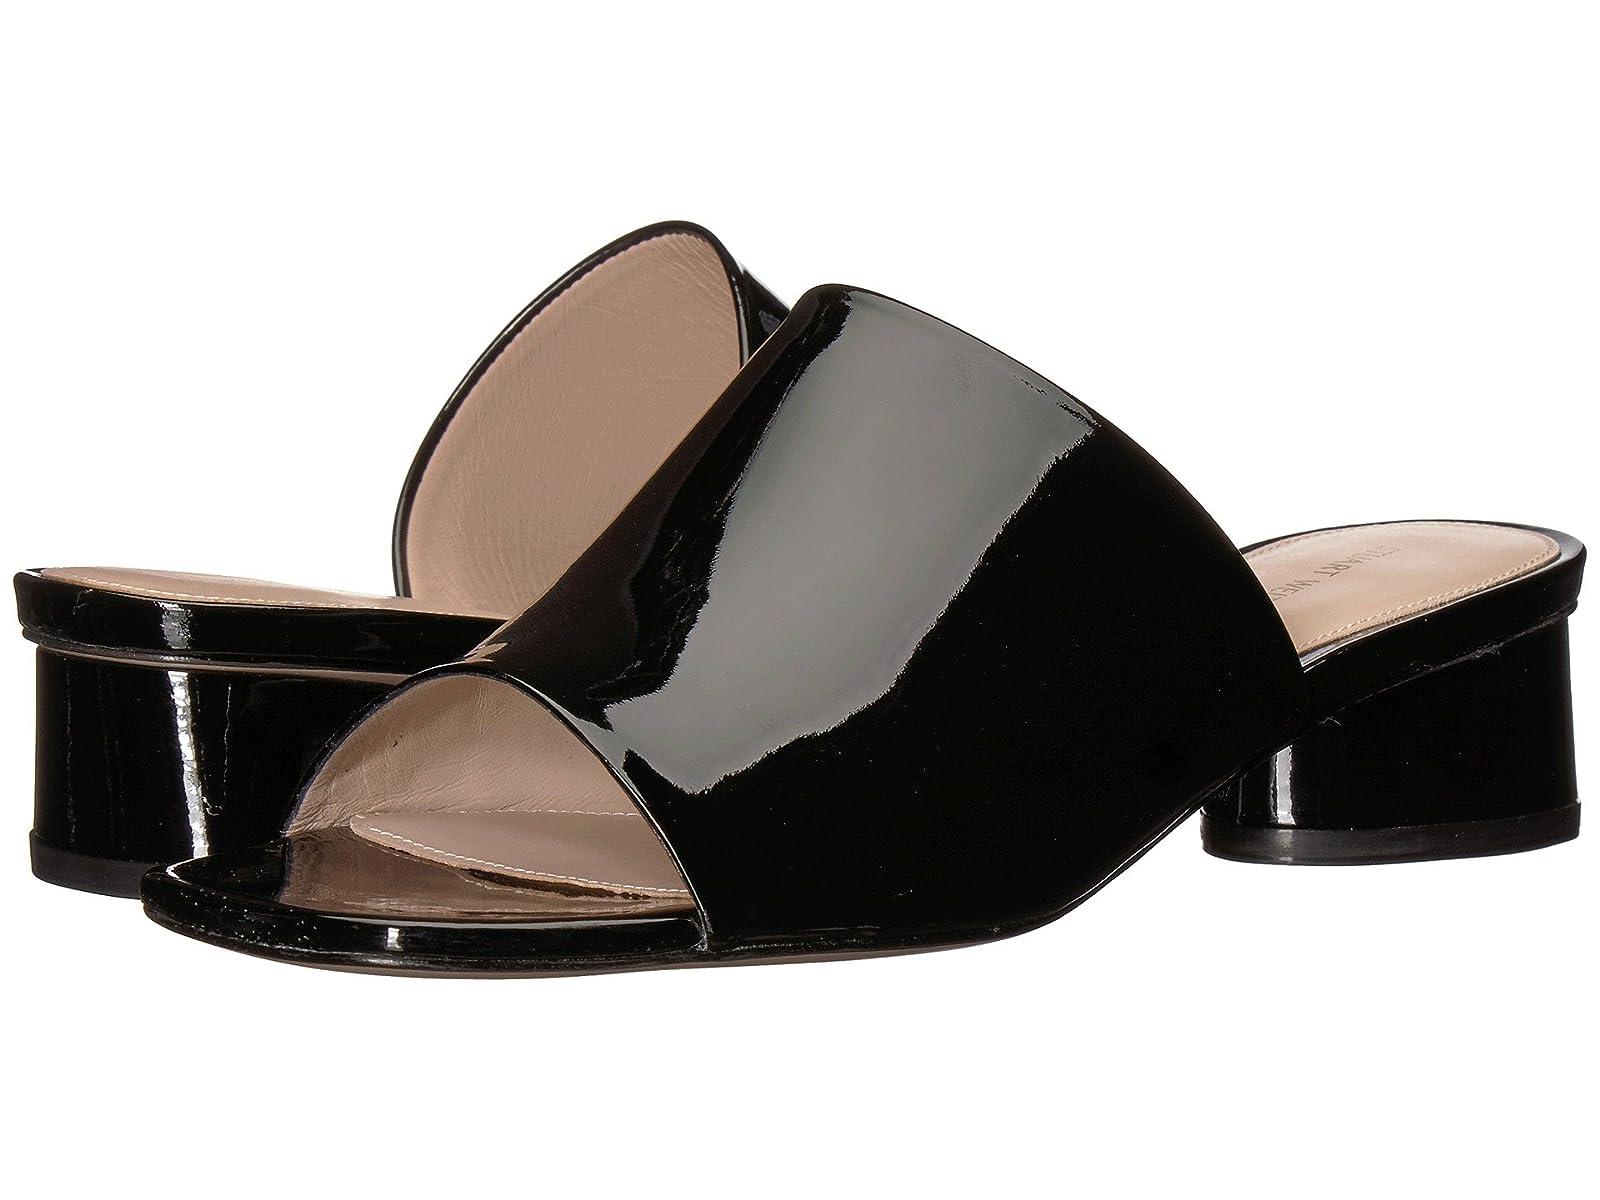 Stuart Weitzman SlideinAtmospheric grades have affordable shoes